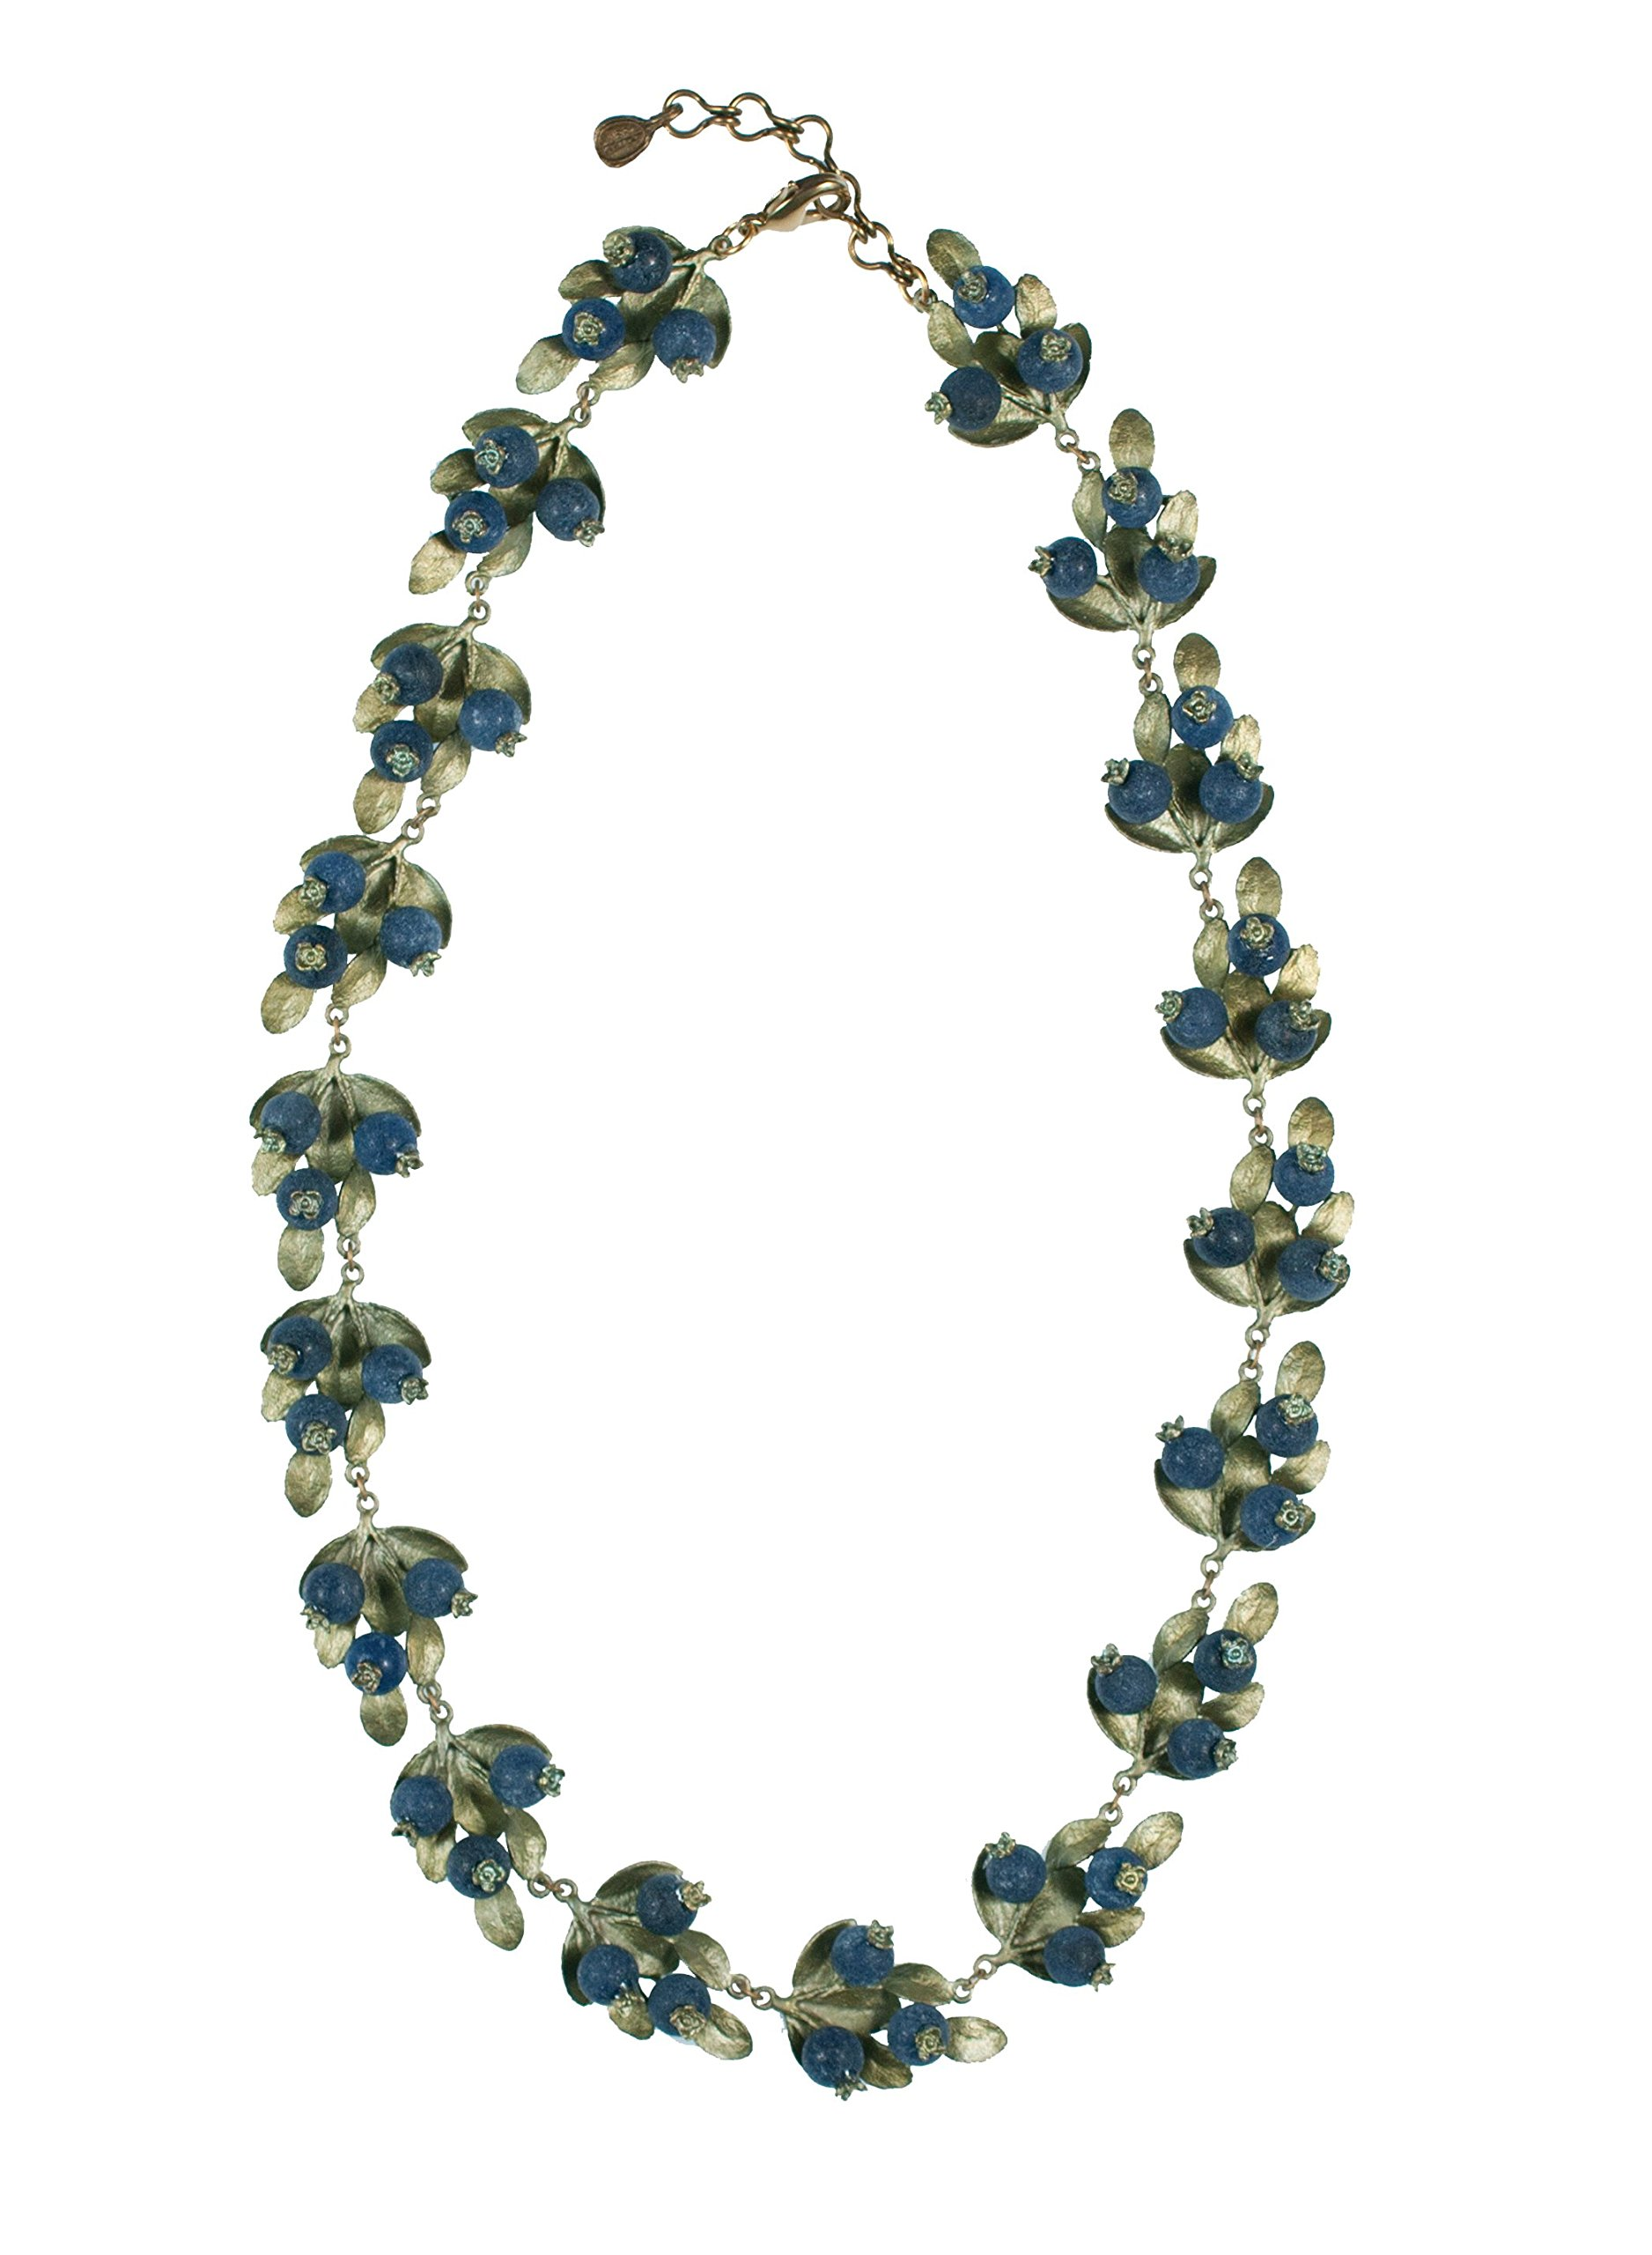 Michael Michaud Blueberry Contour Necklace for Silver Seasons...